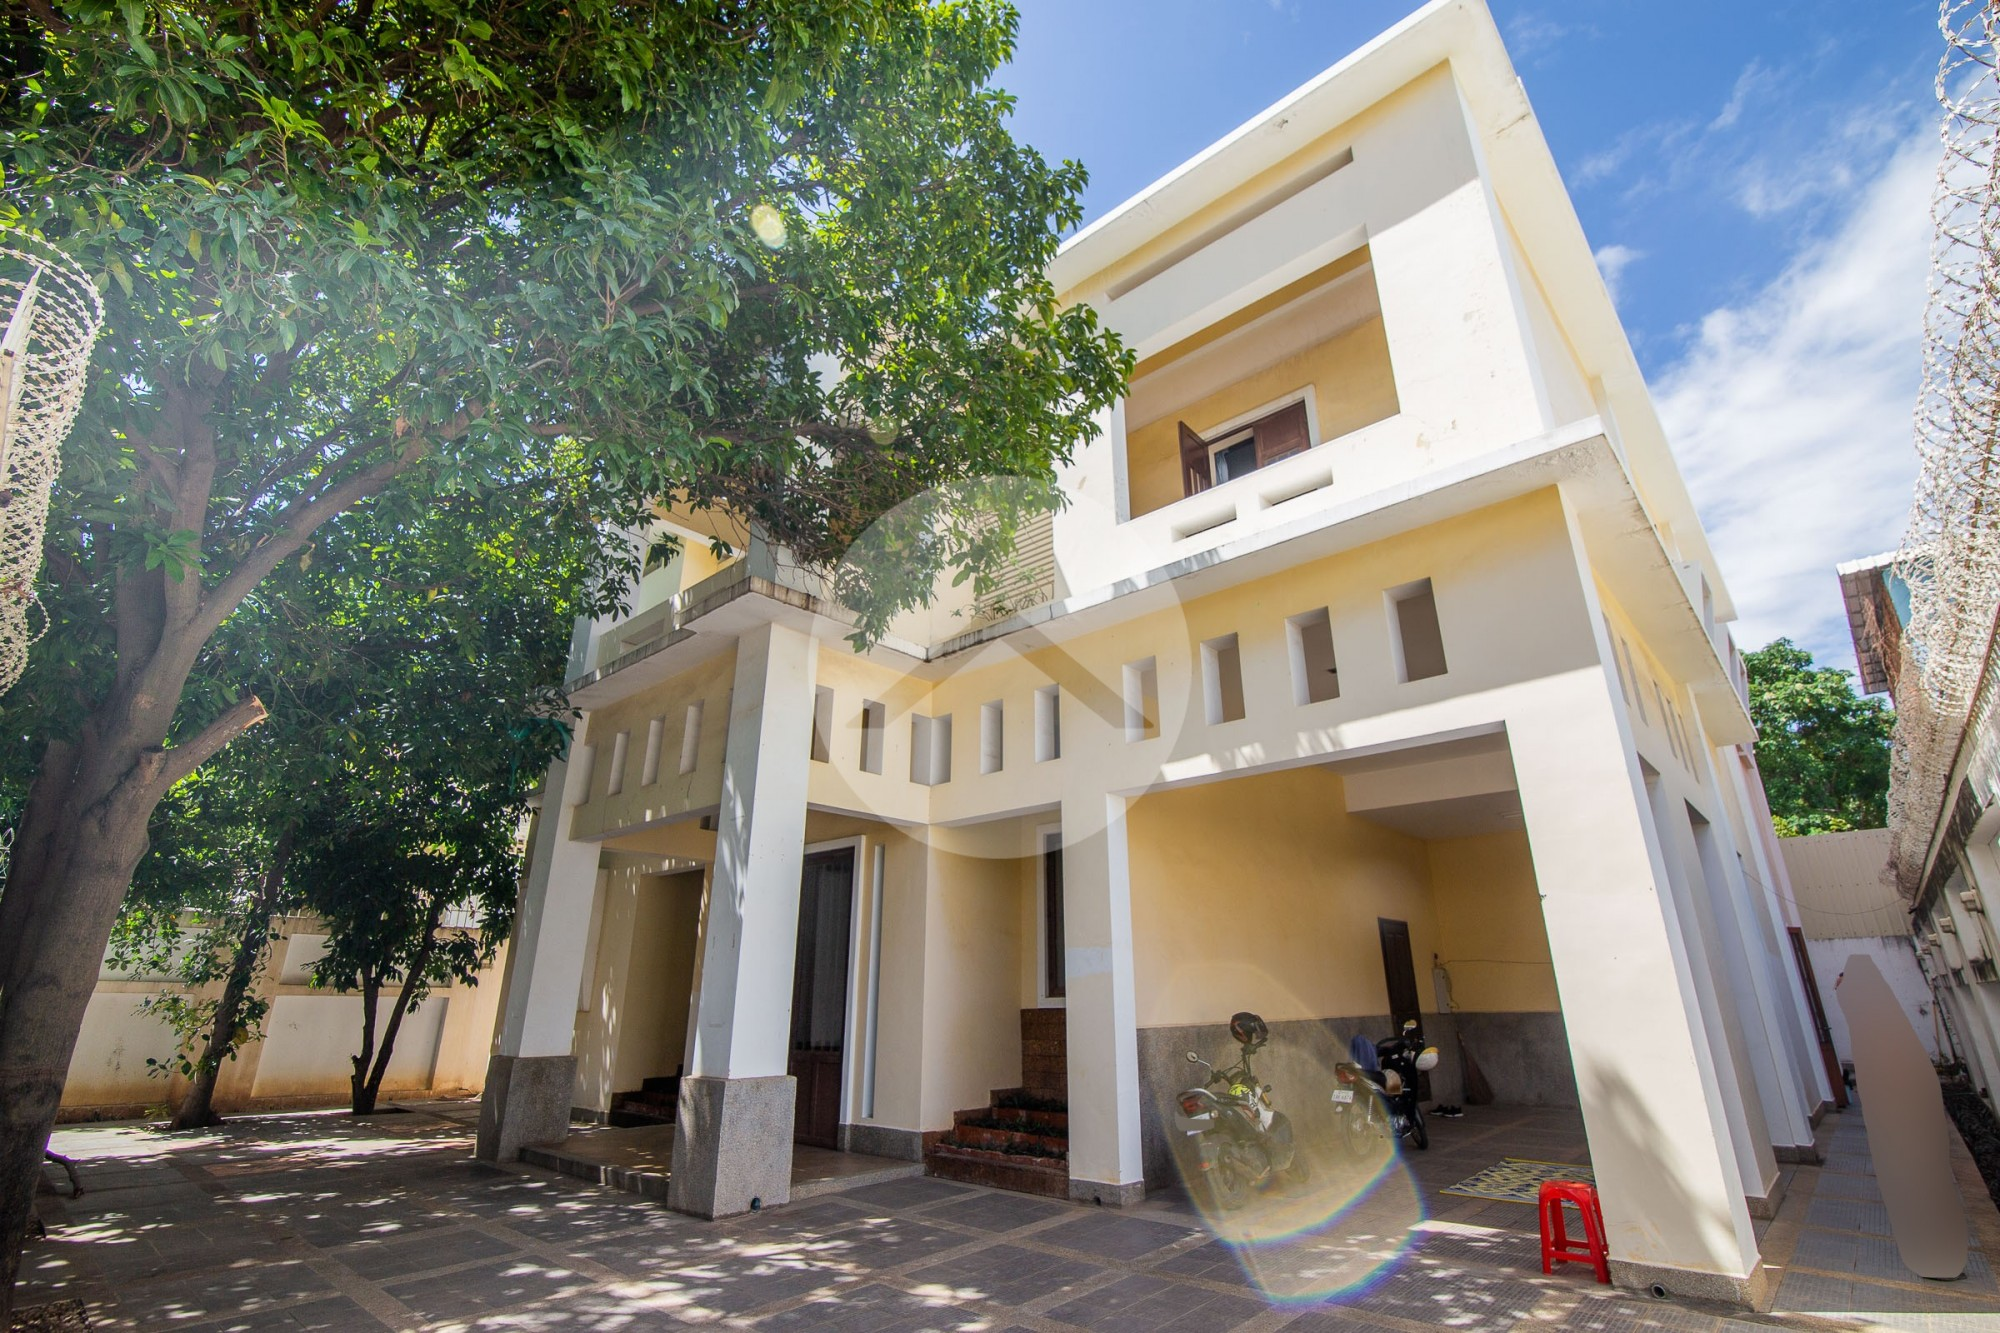 6 Bedroom Villa For Rent - Toul Kork, Phnom Penh